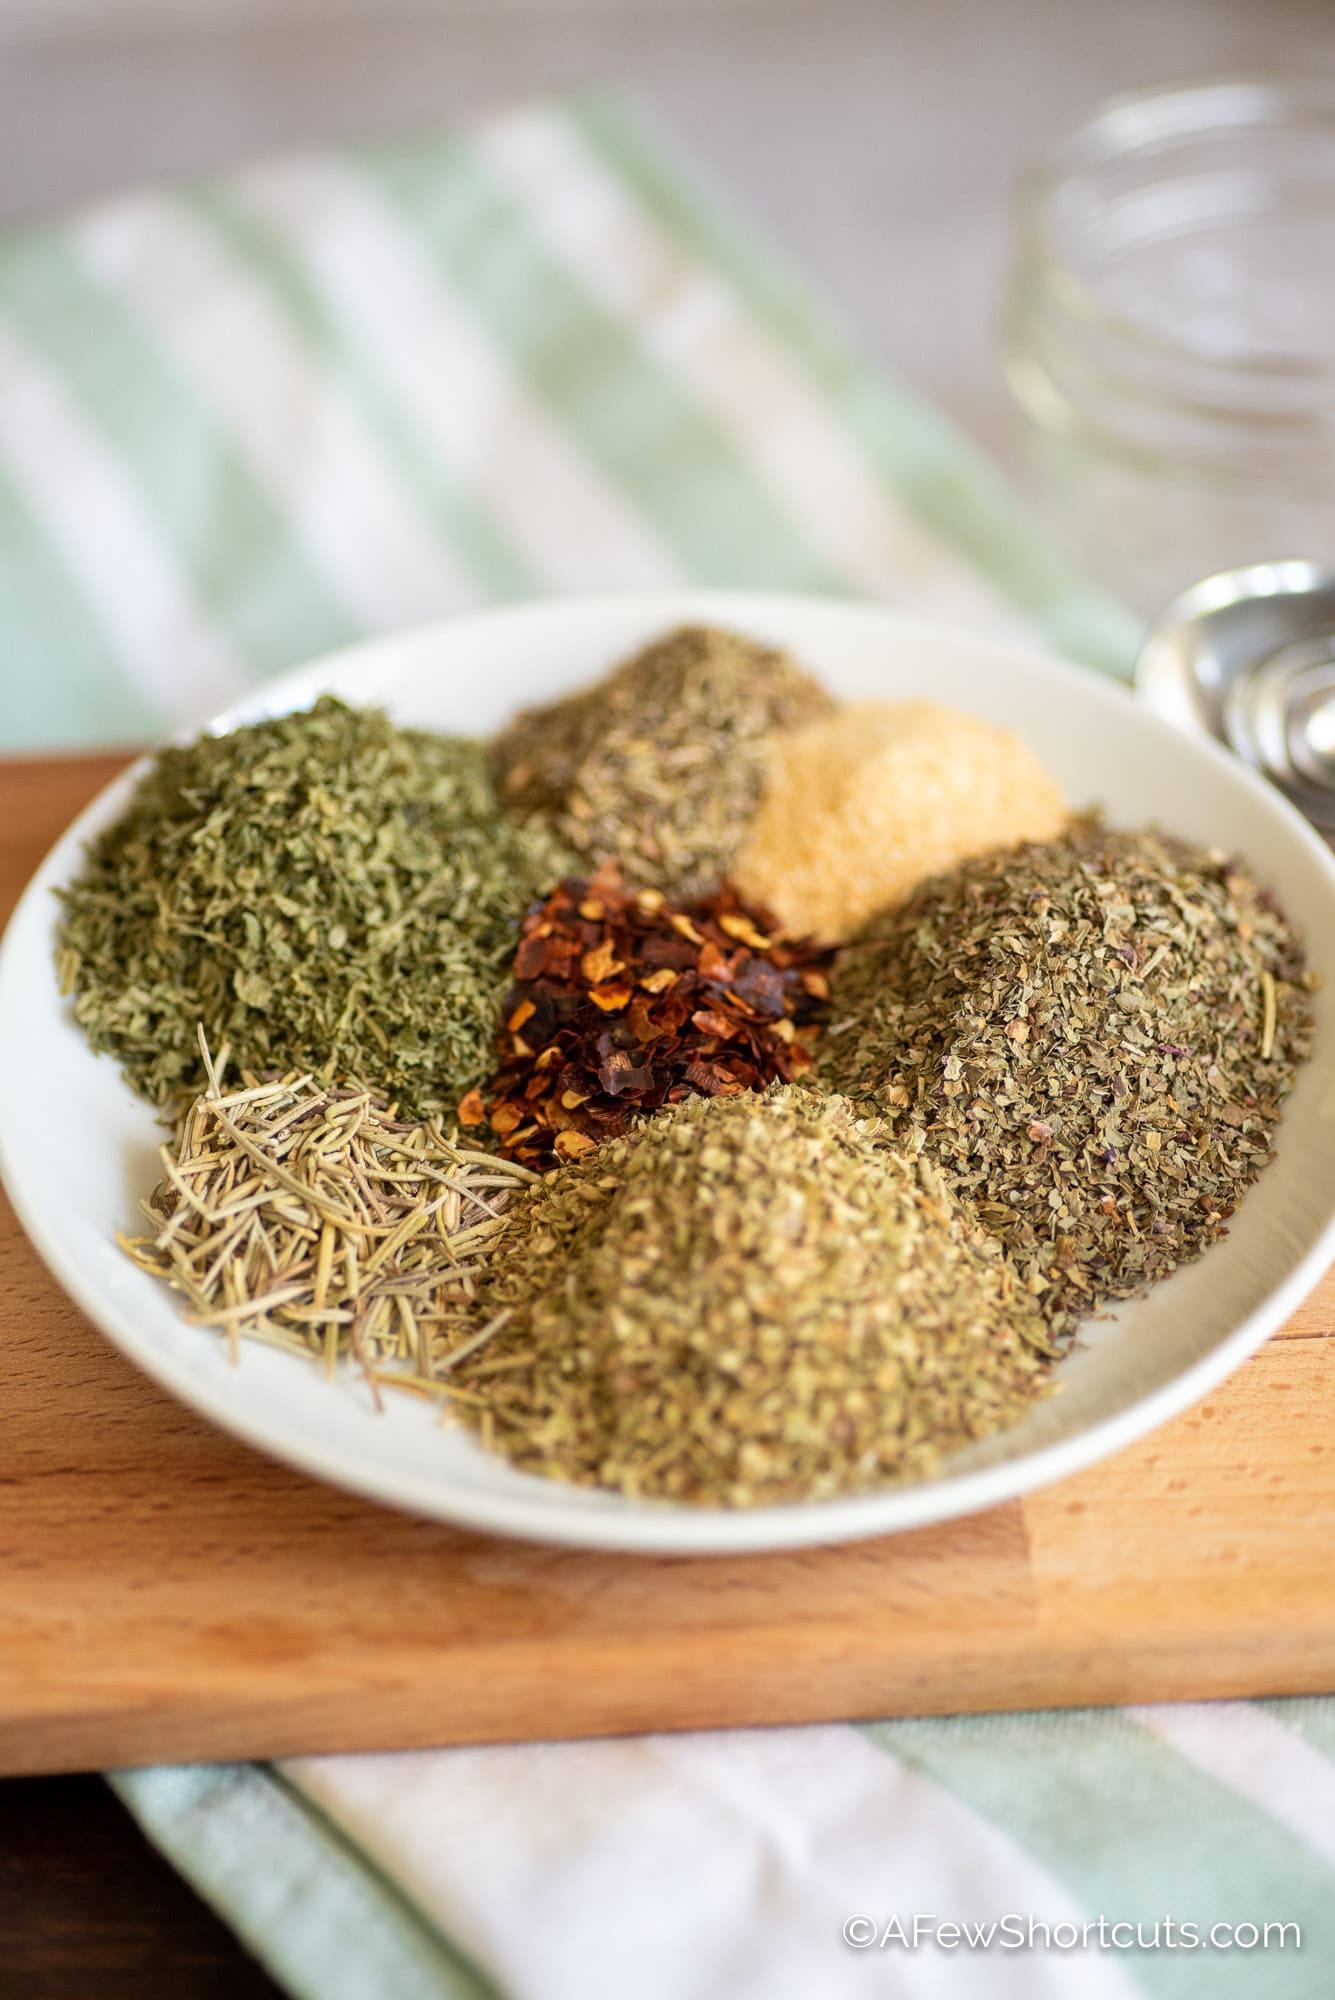 parsley, rosemary, oregano, red pepper, thyme, garlic, basil, on plate